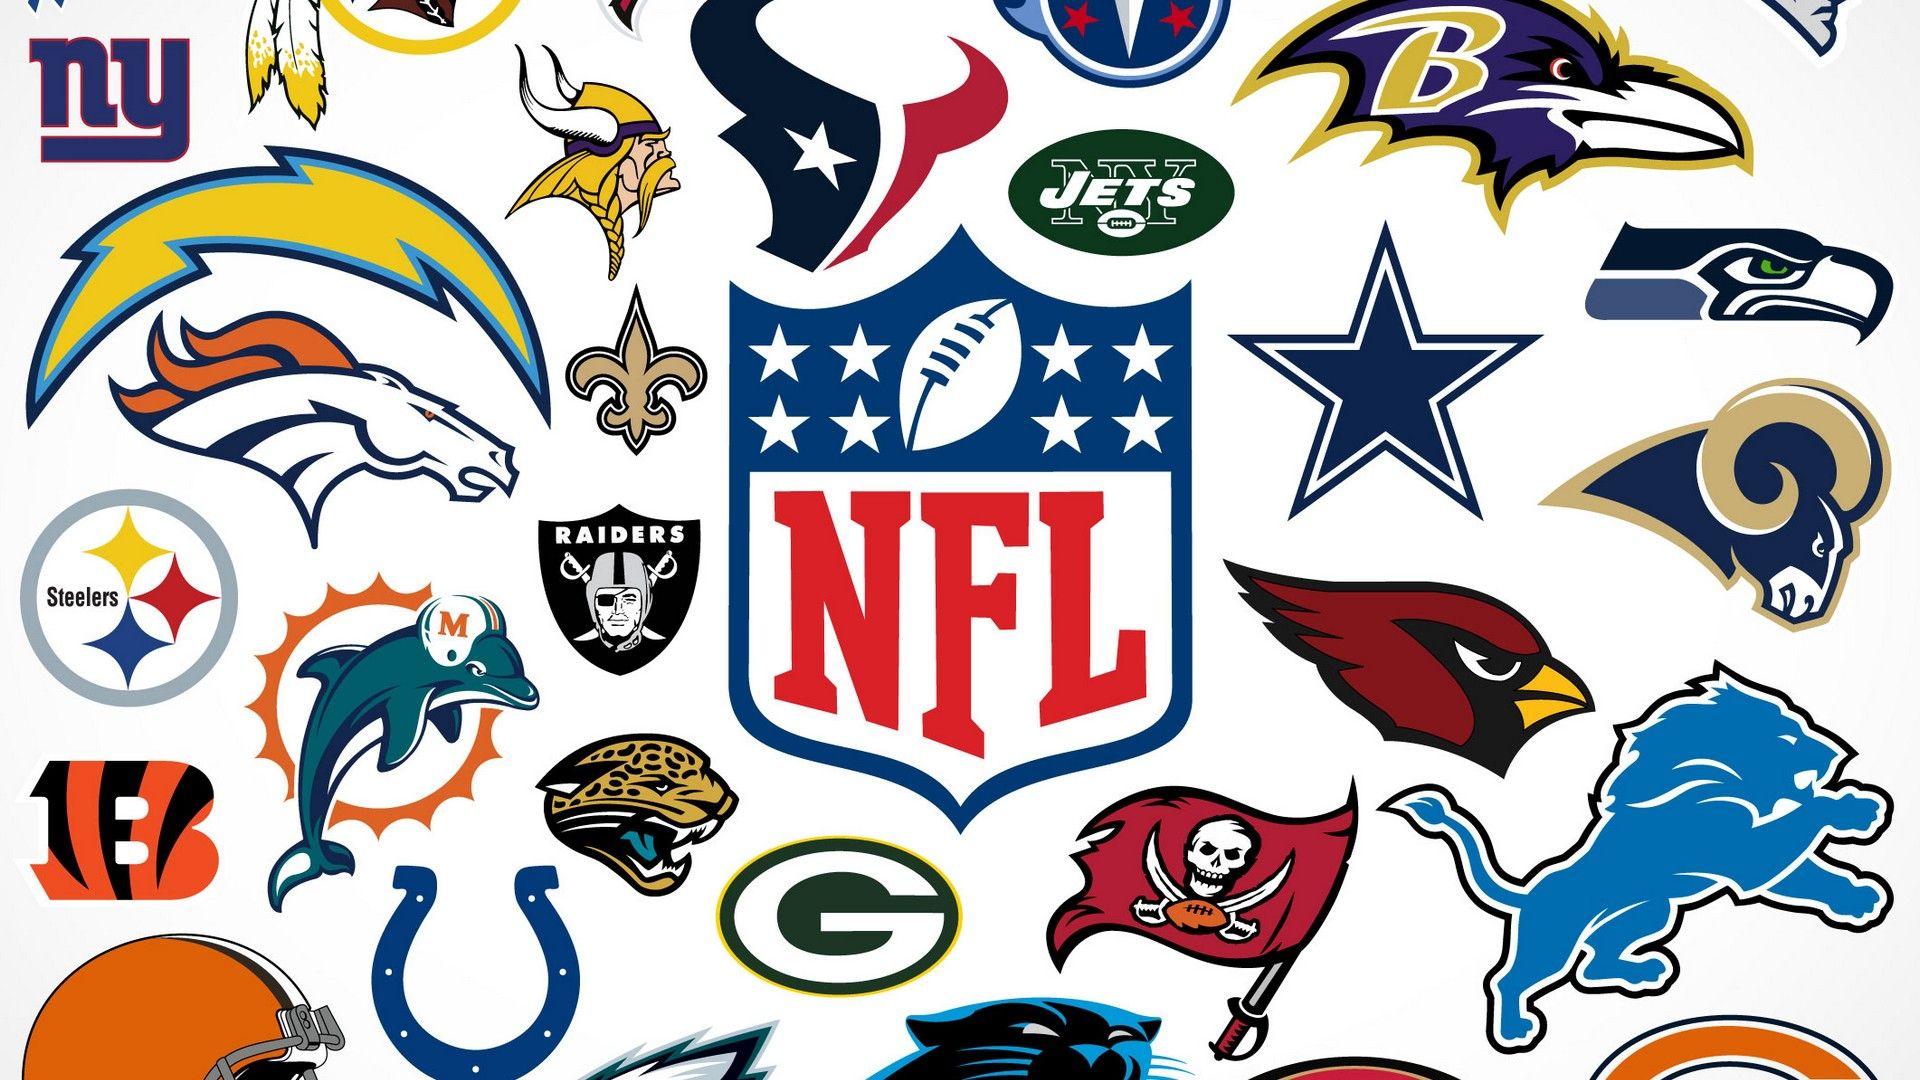 Windows Wallpaper Cool Nfl 2020 Nfl Football Wallpapers Nfl Teams Logos Nfl Logo Nfl Teams